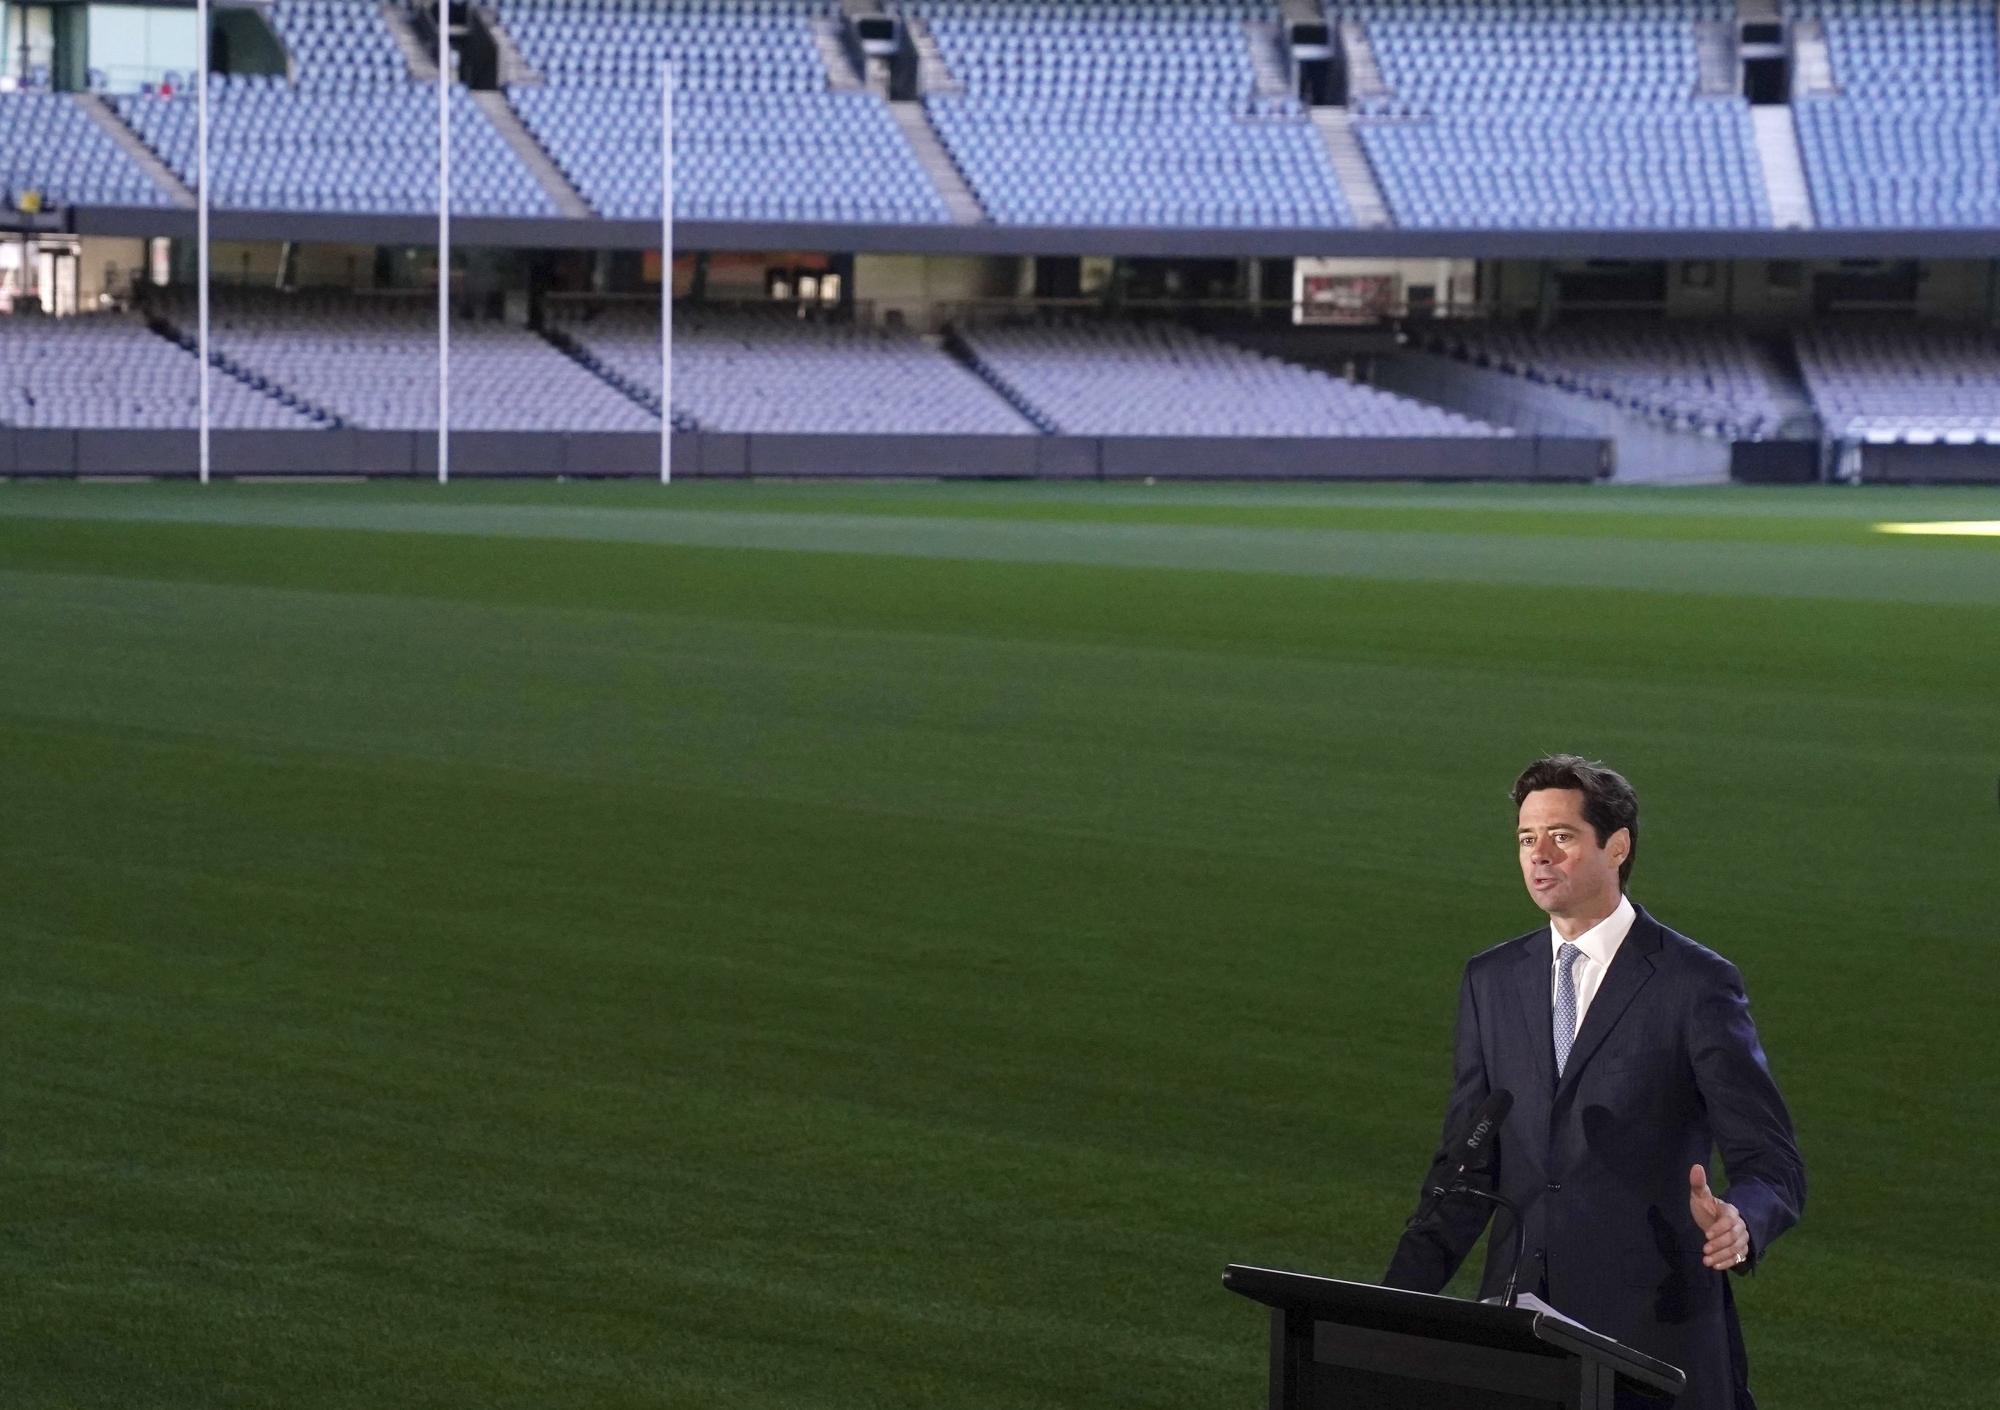 Australian Rules Football League Ready To Resume June 11 Wtop